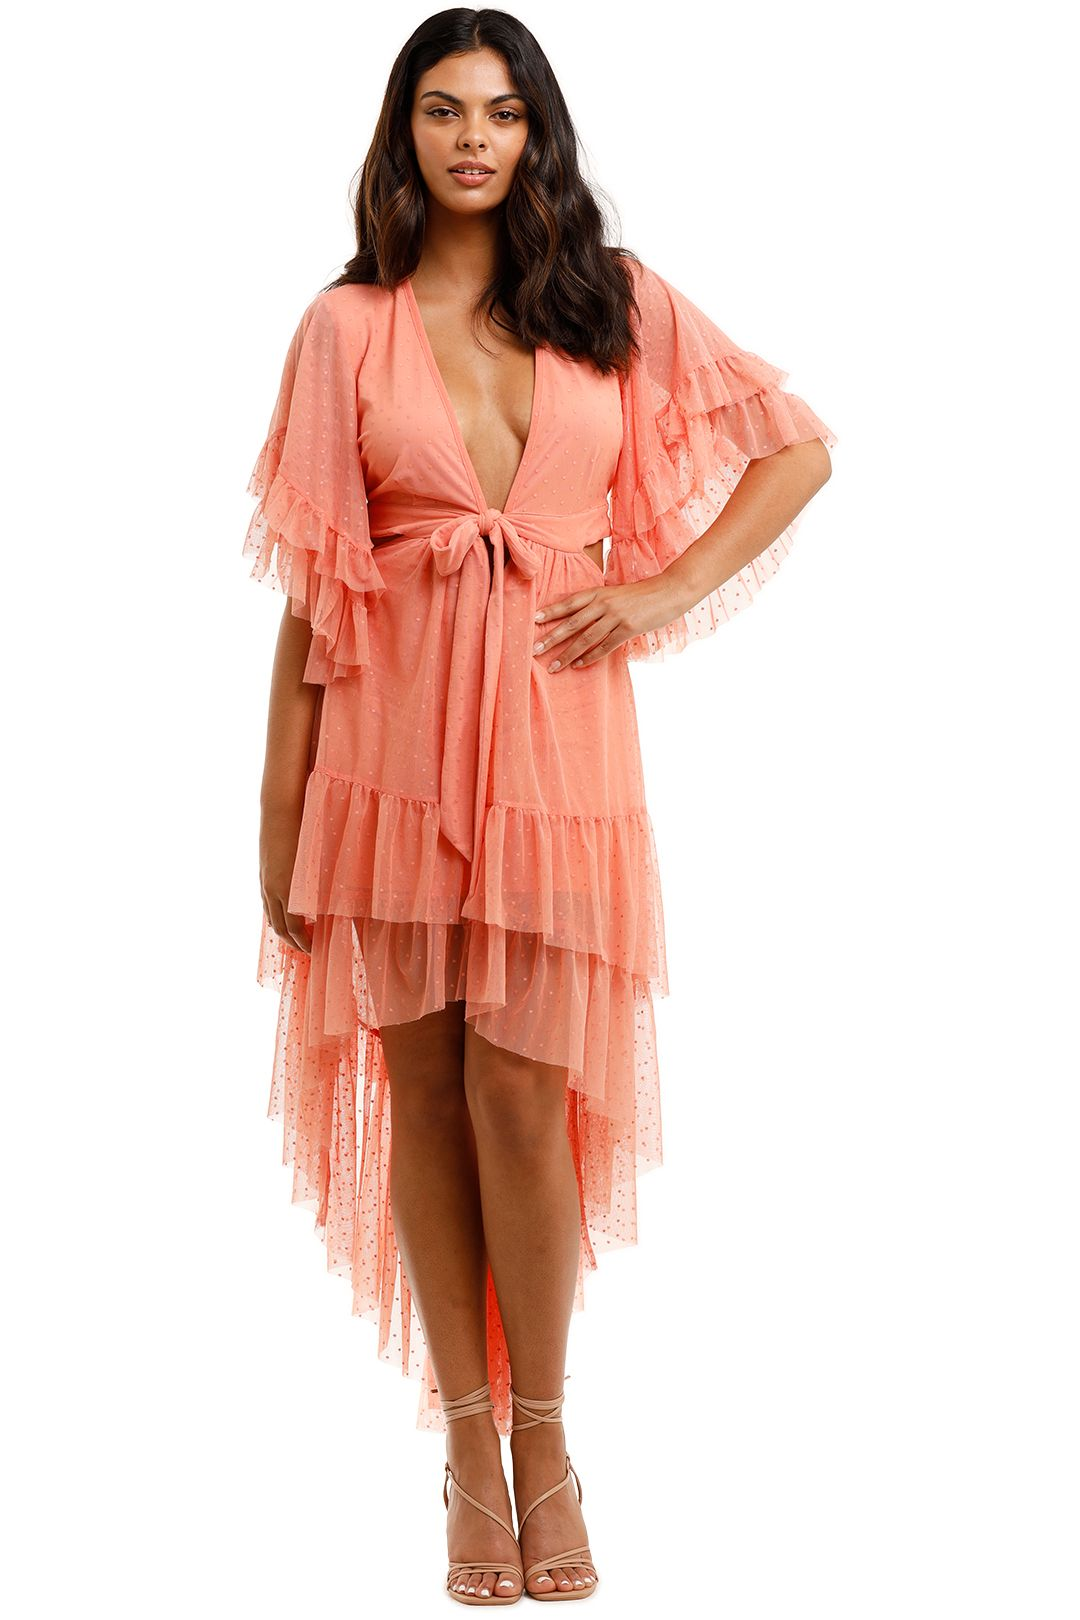 Spell Grace Cutout Gown Peach Cut Out on Waist